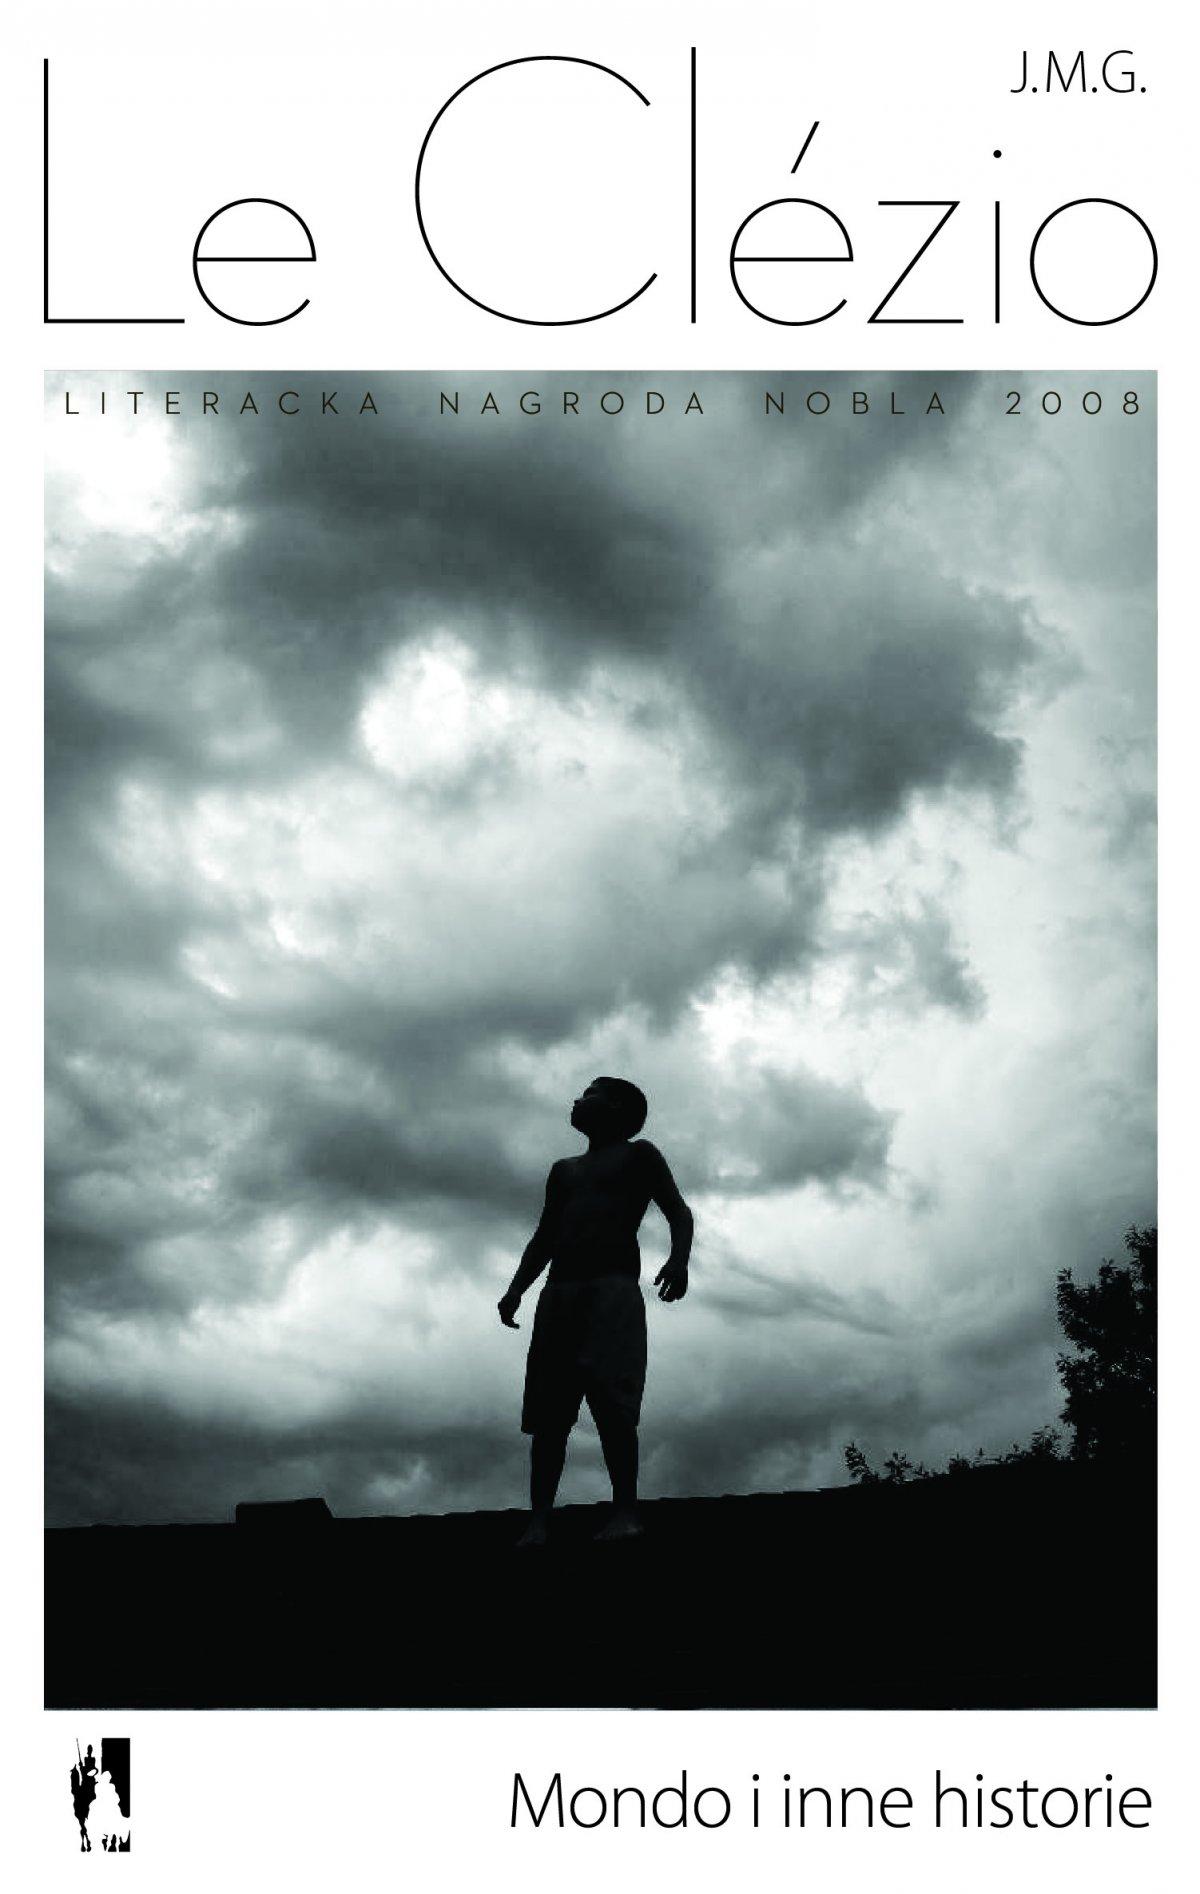 Mondo i inne historie - Ebook (Książka EPUB) do pobrania w formacie EPUB